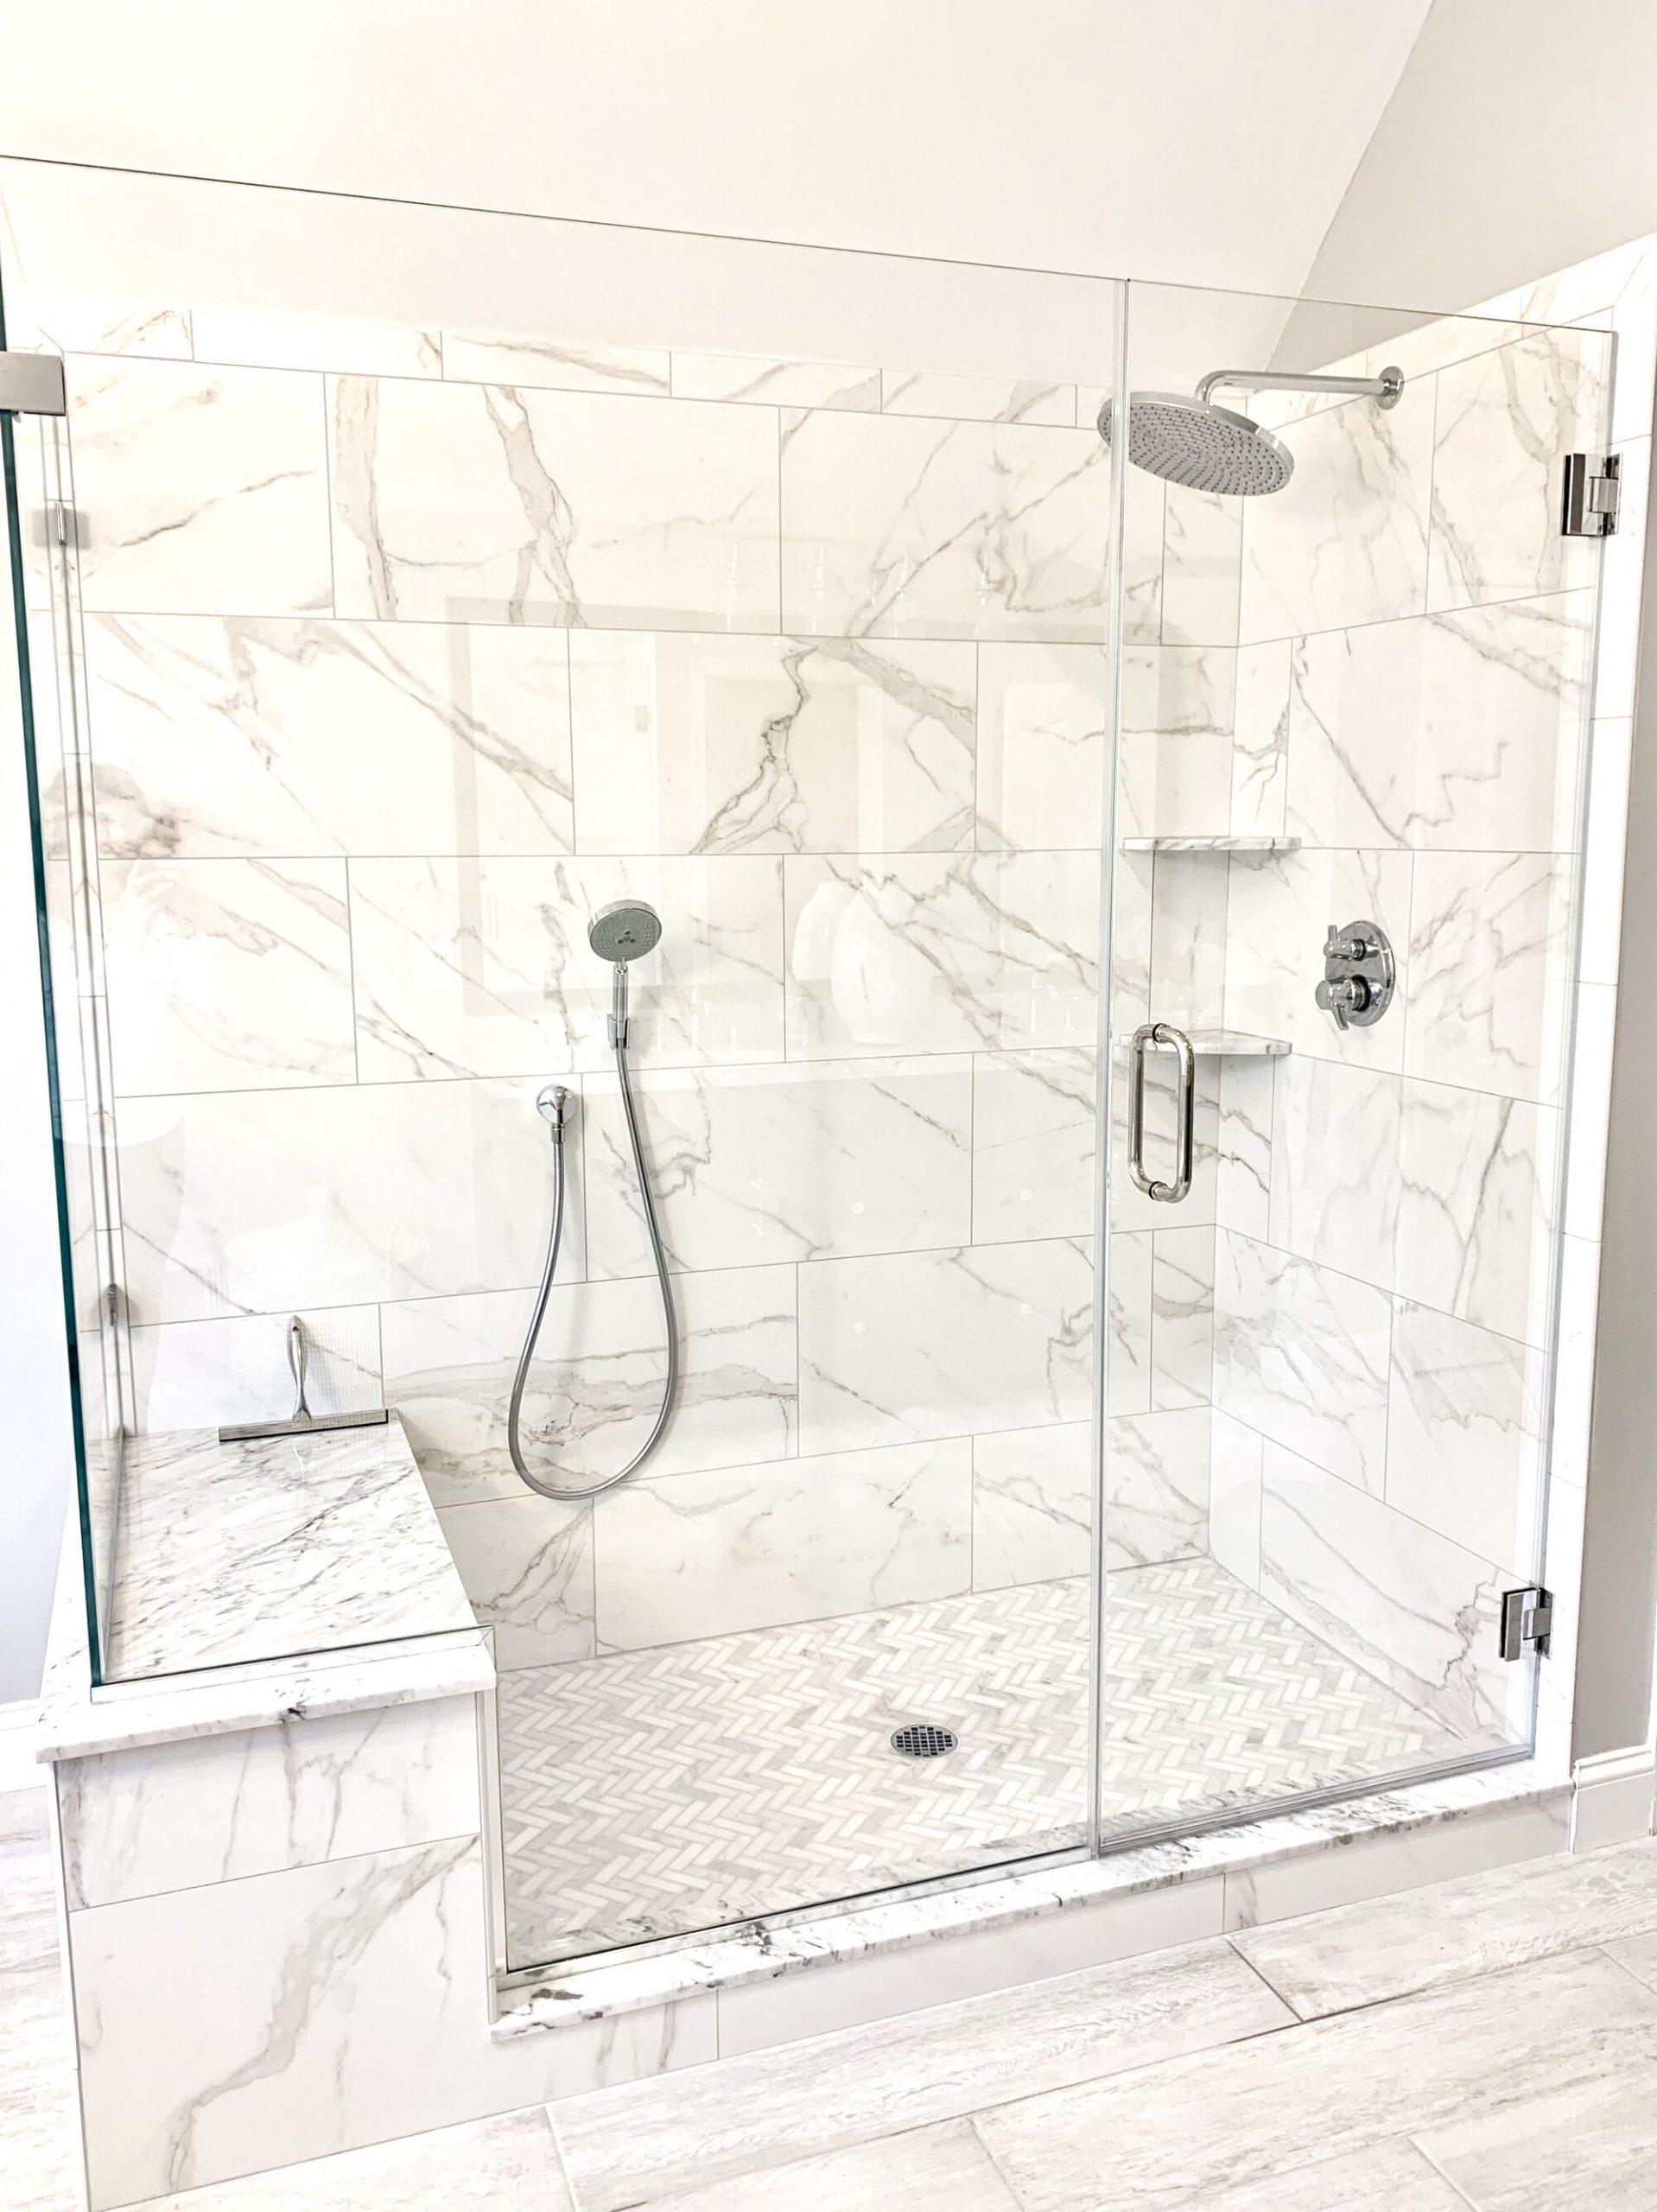 Kohler Kallista Satin Nickel Rainshower, Porcelain 12 x 24 Tiles, 1 x 3 Herringbone Shower Floor in Sparta, Sussex County NJ